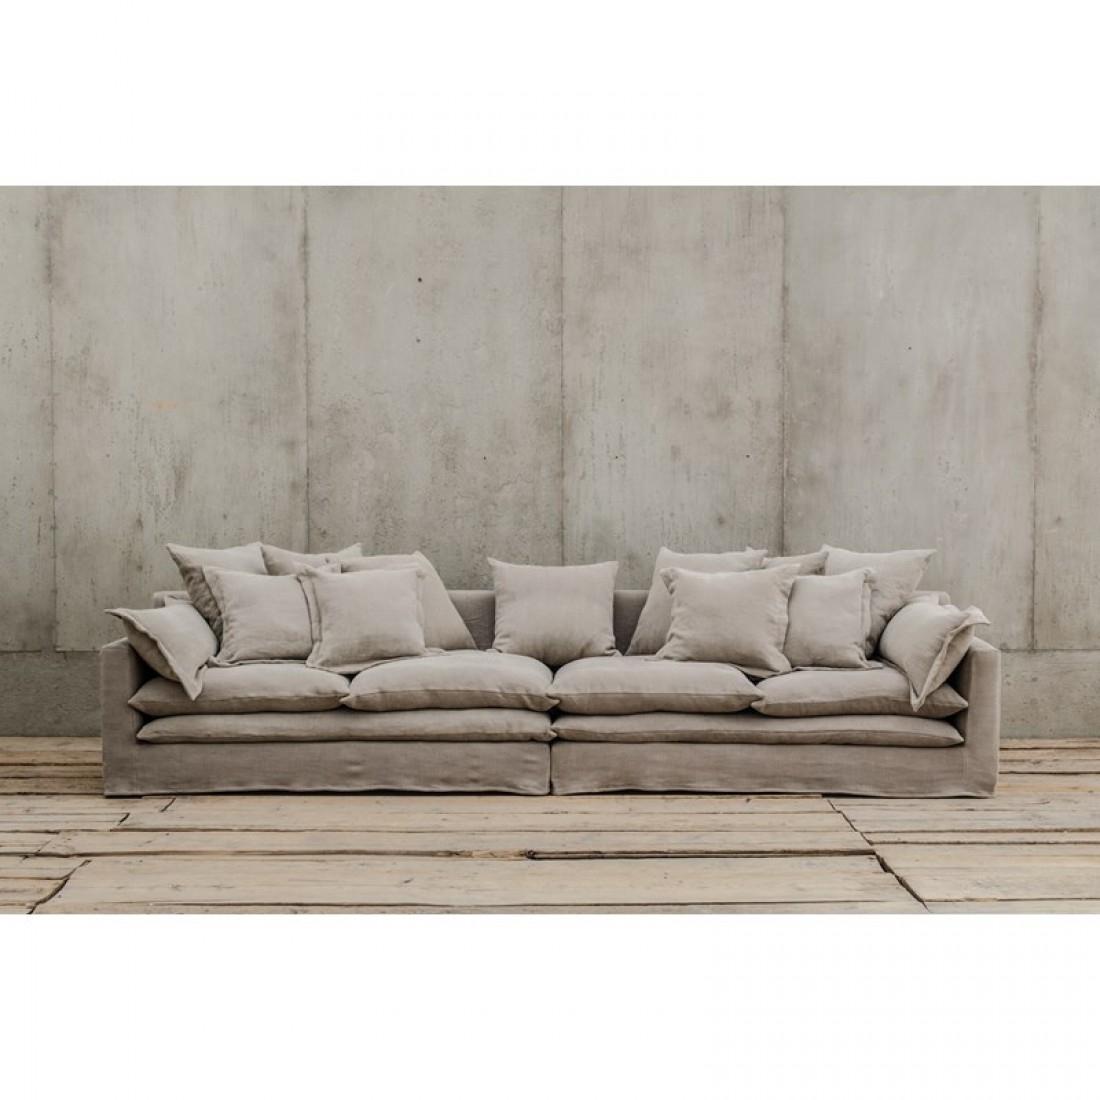 4780 Fourhands-Cousin Oswald's Sofa Soft Sand-Fh-Cda036-Bi0000 within Soft Sofas